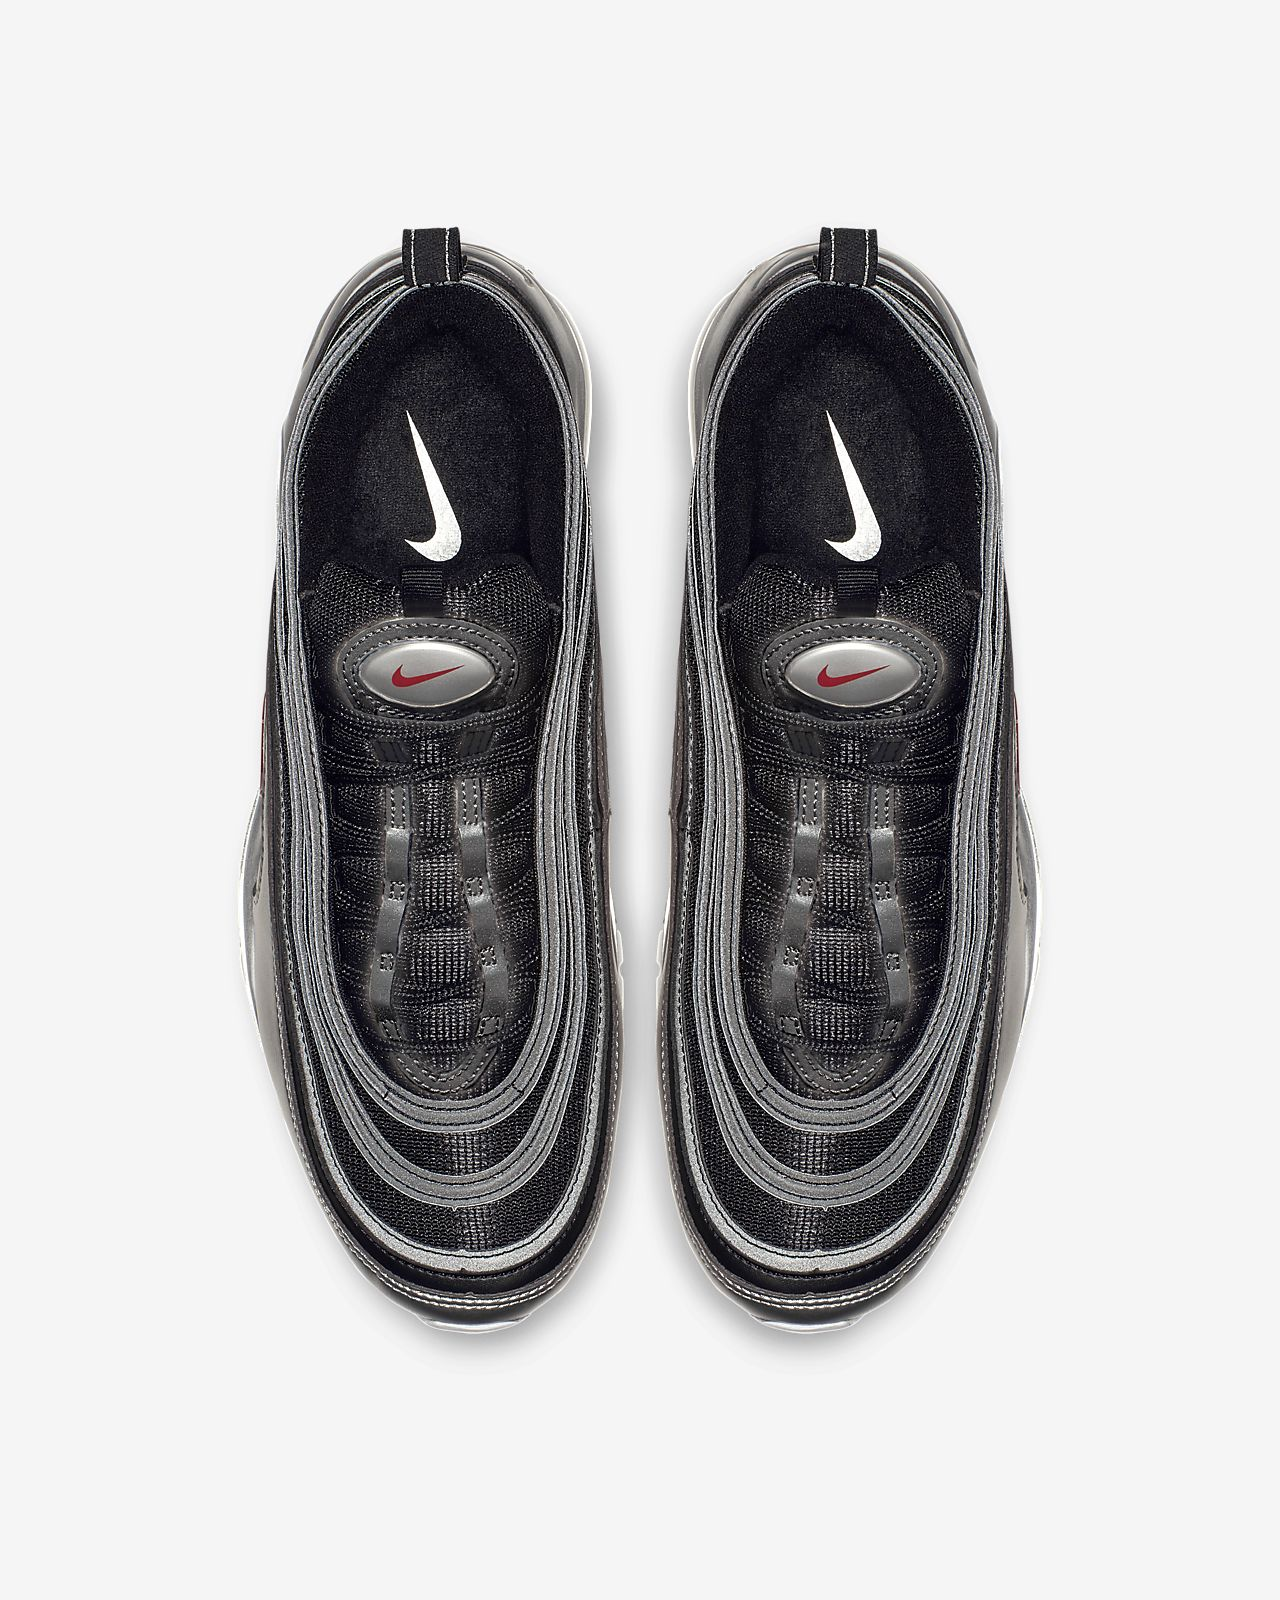 7c1fa2095ba Nike Air Max 97 QS Men s Shoe. Nike.com SI